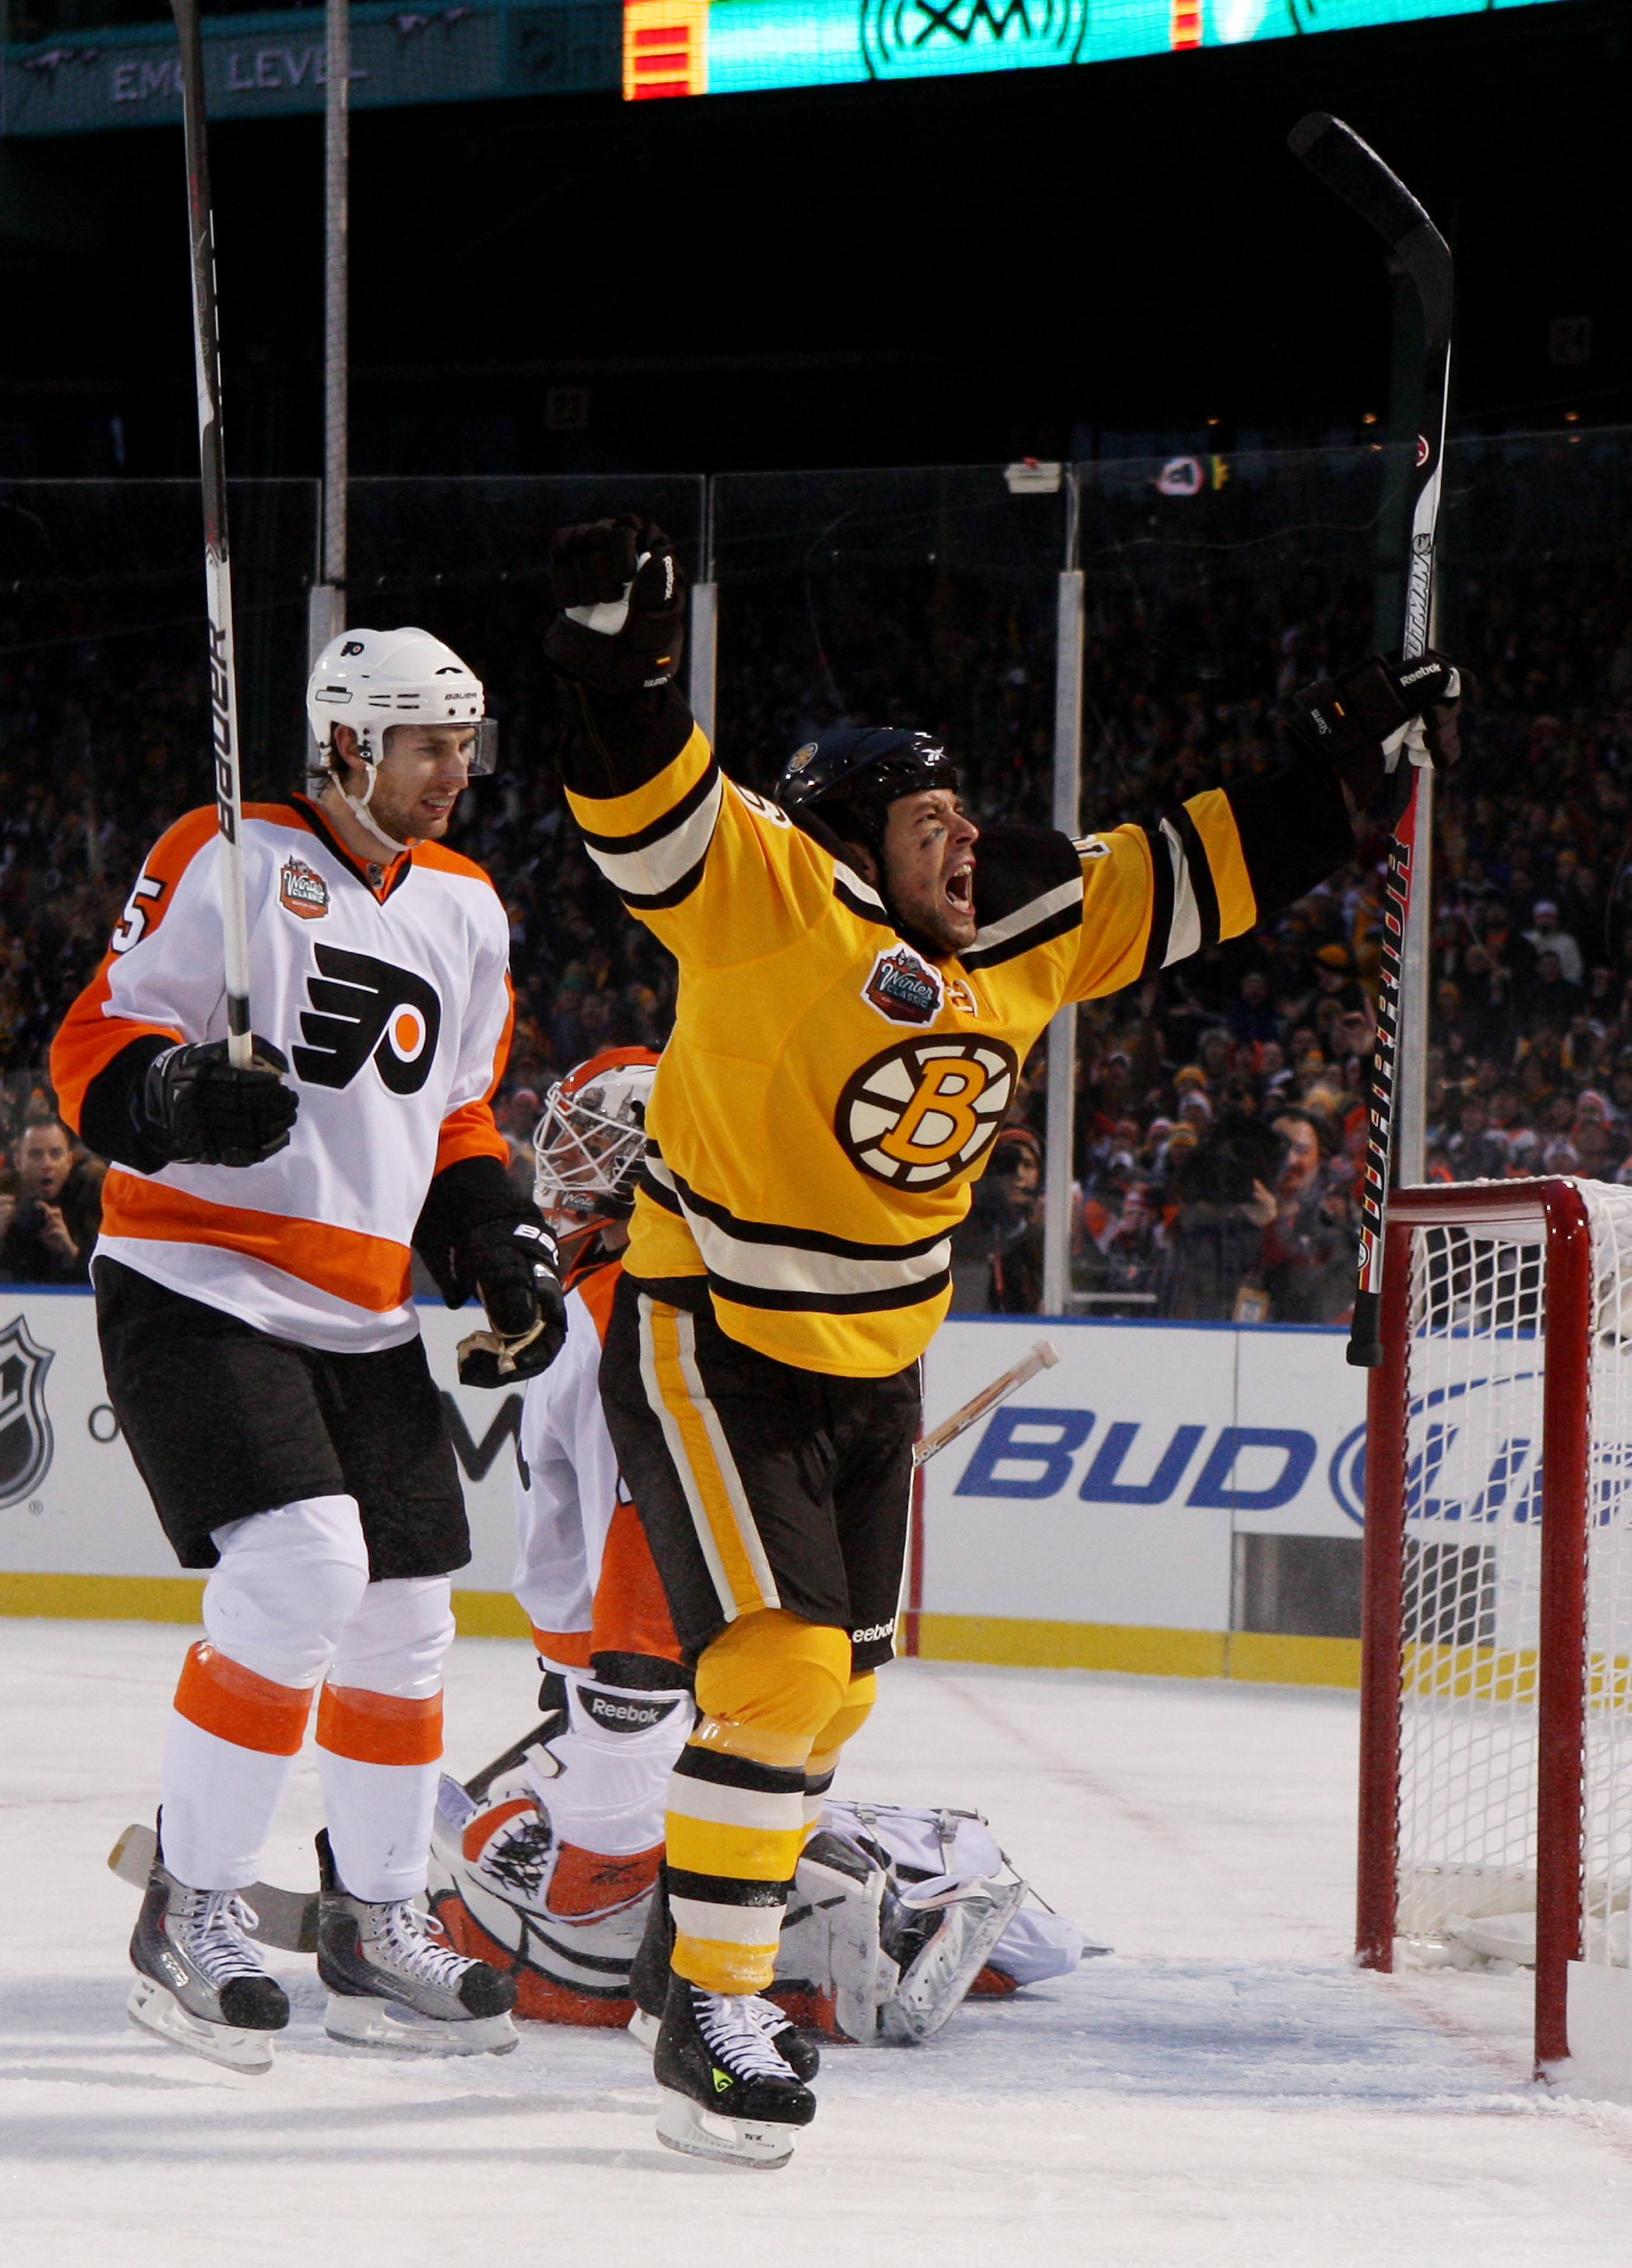 BOSTON - JANUARY 01:  Marco Sturm #16 of the Boston Bruins celebrates scoring a goal to defeat the Philadelphia Flyers 2-1 in overtime during the 2010 Bridgestone Winter Classic at Fenway Park on January 1, 2010 in Boston, Massachusetts.  (Photo by Jim Mc